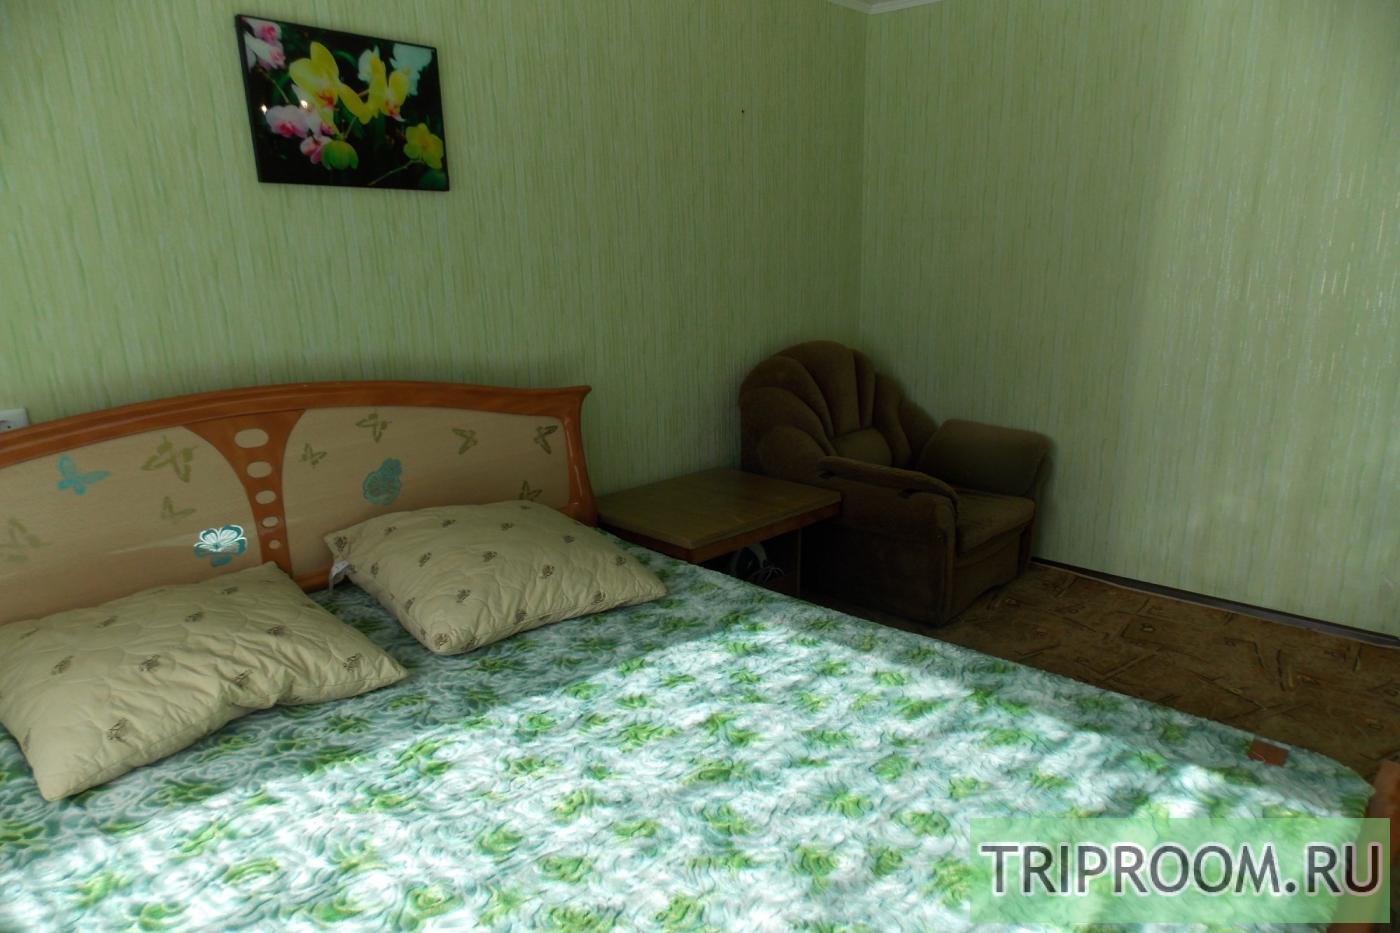 1-комнатная квартира посуточно (вариант № 16873), ул. Кирова улица, фото № 3